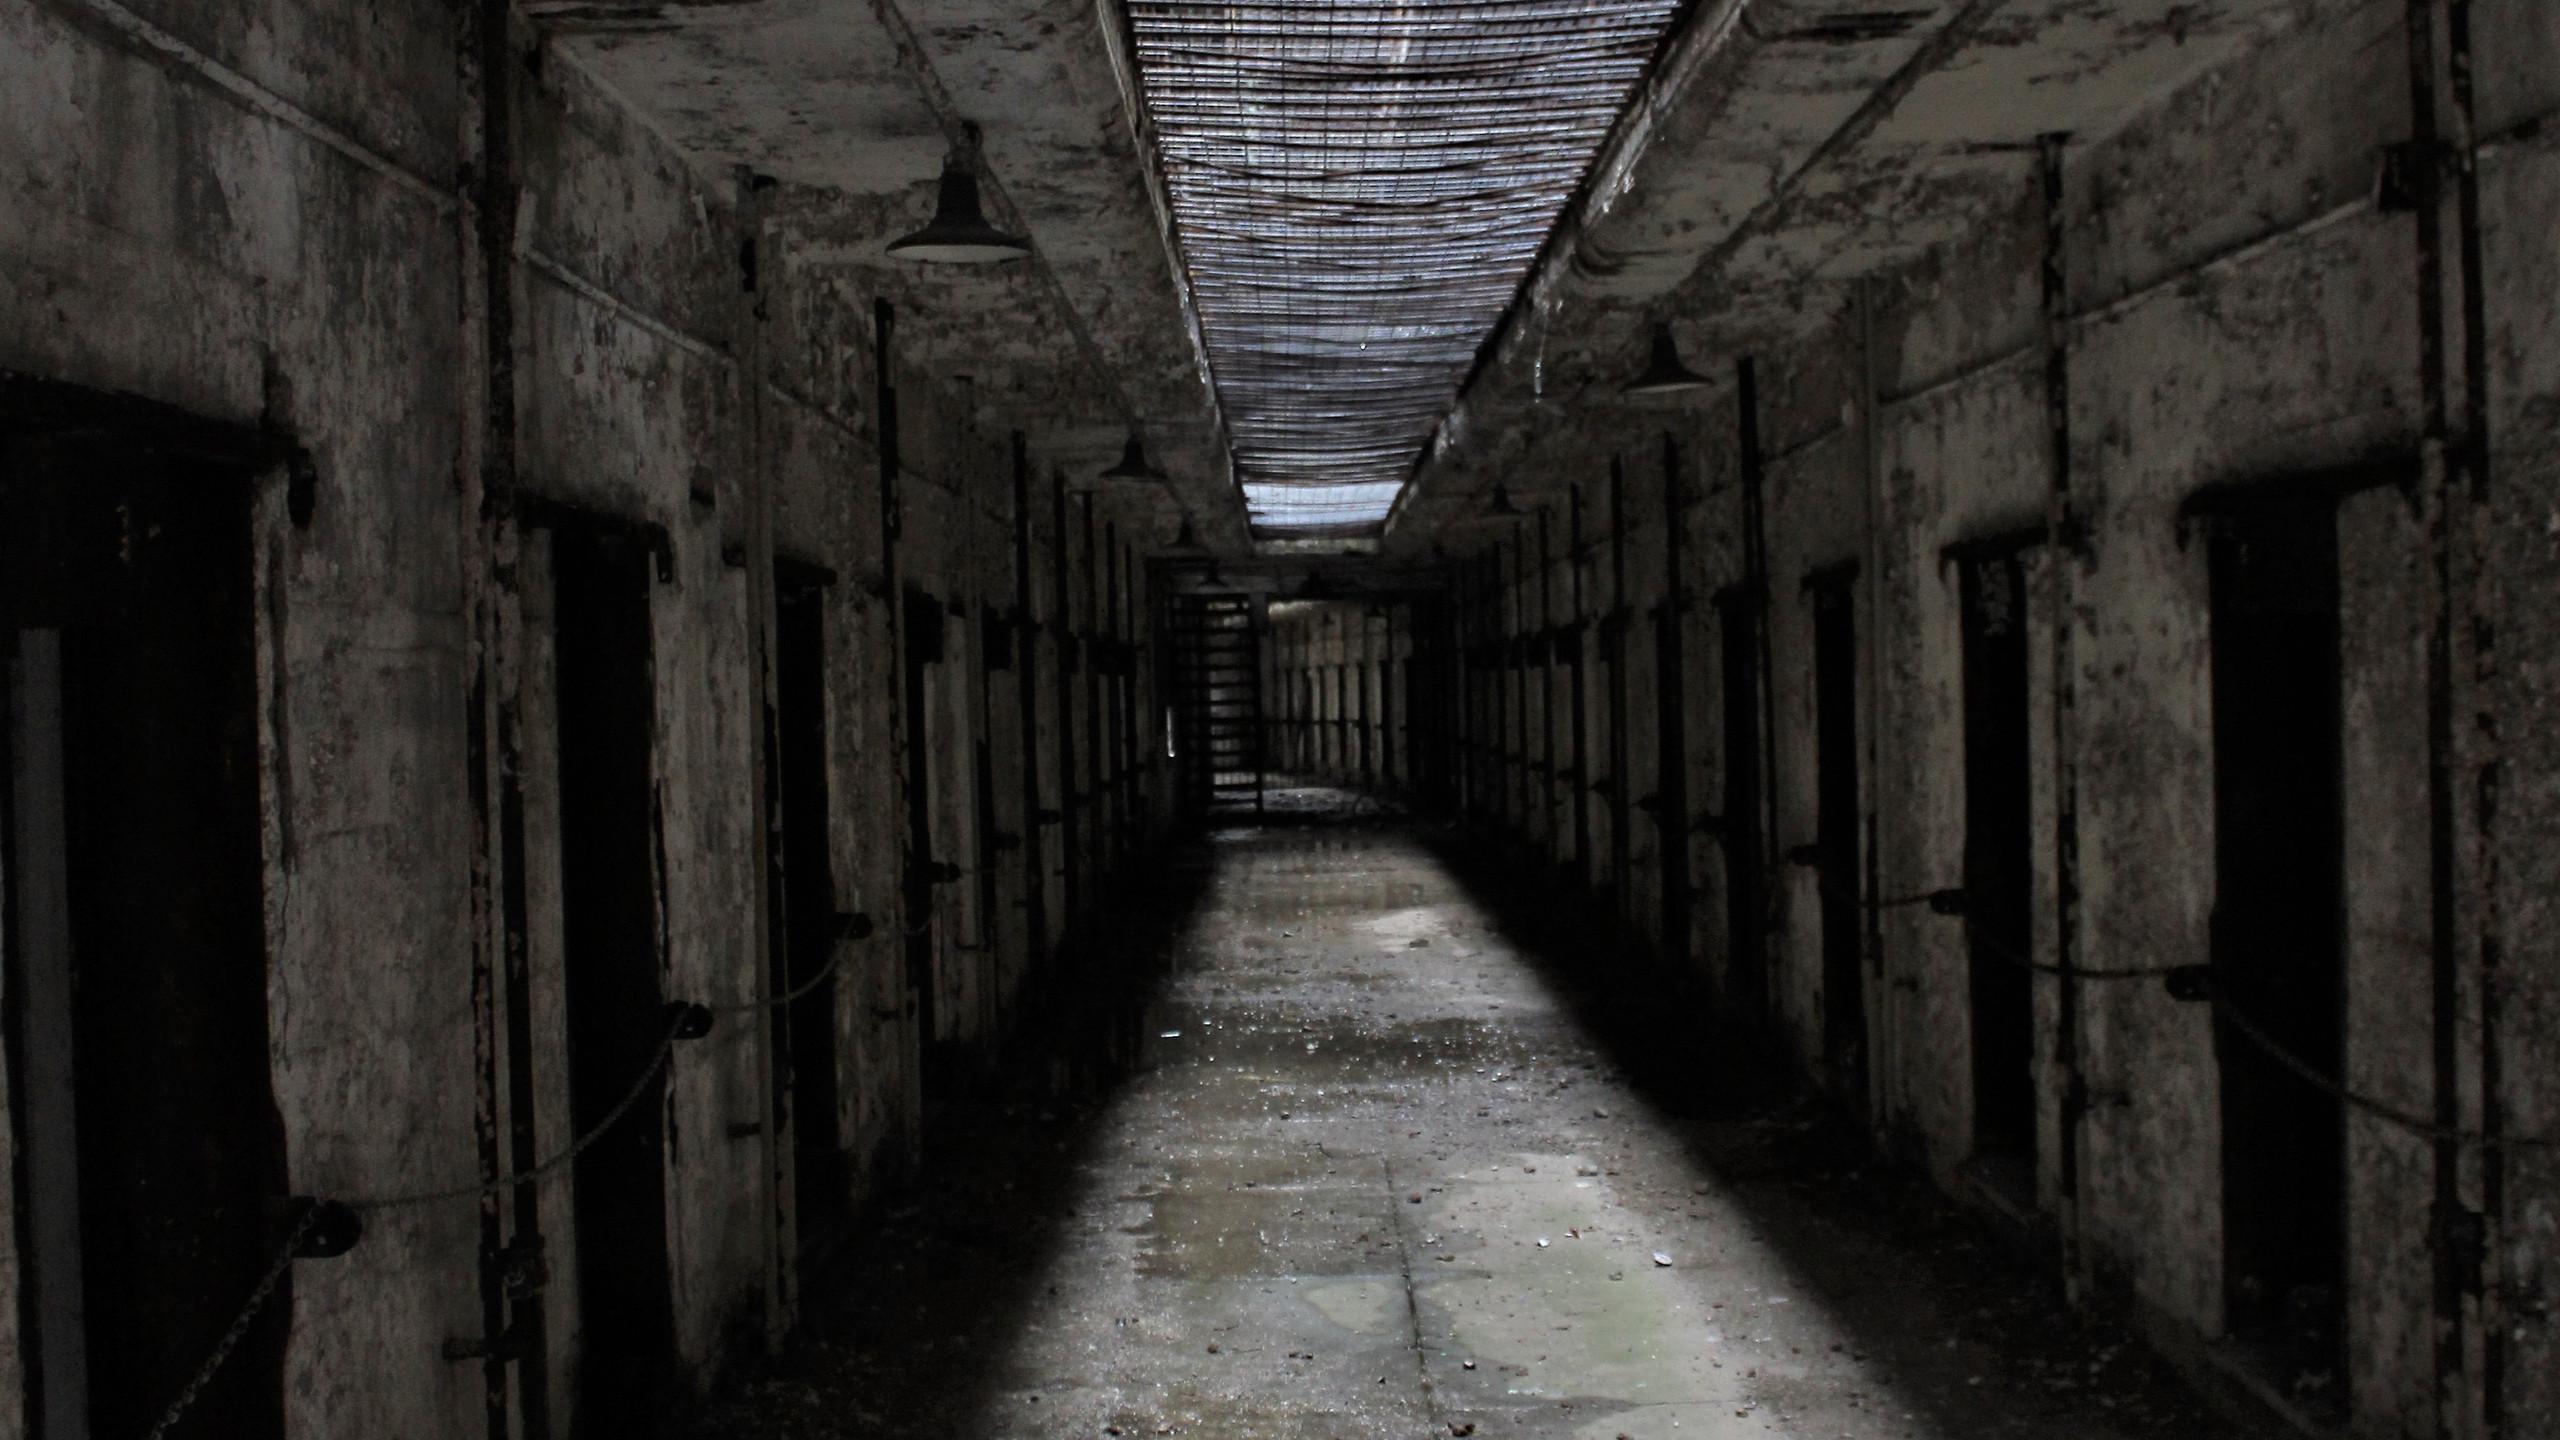 Cellblock 14